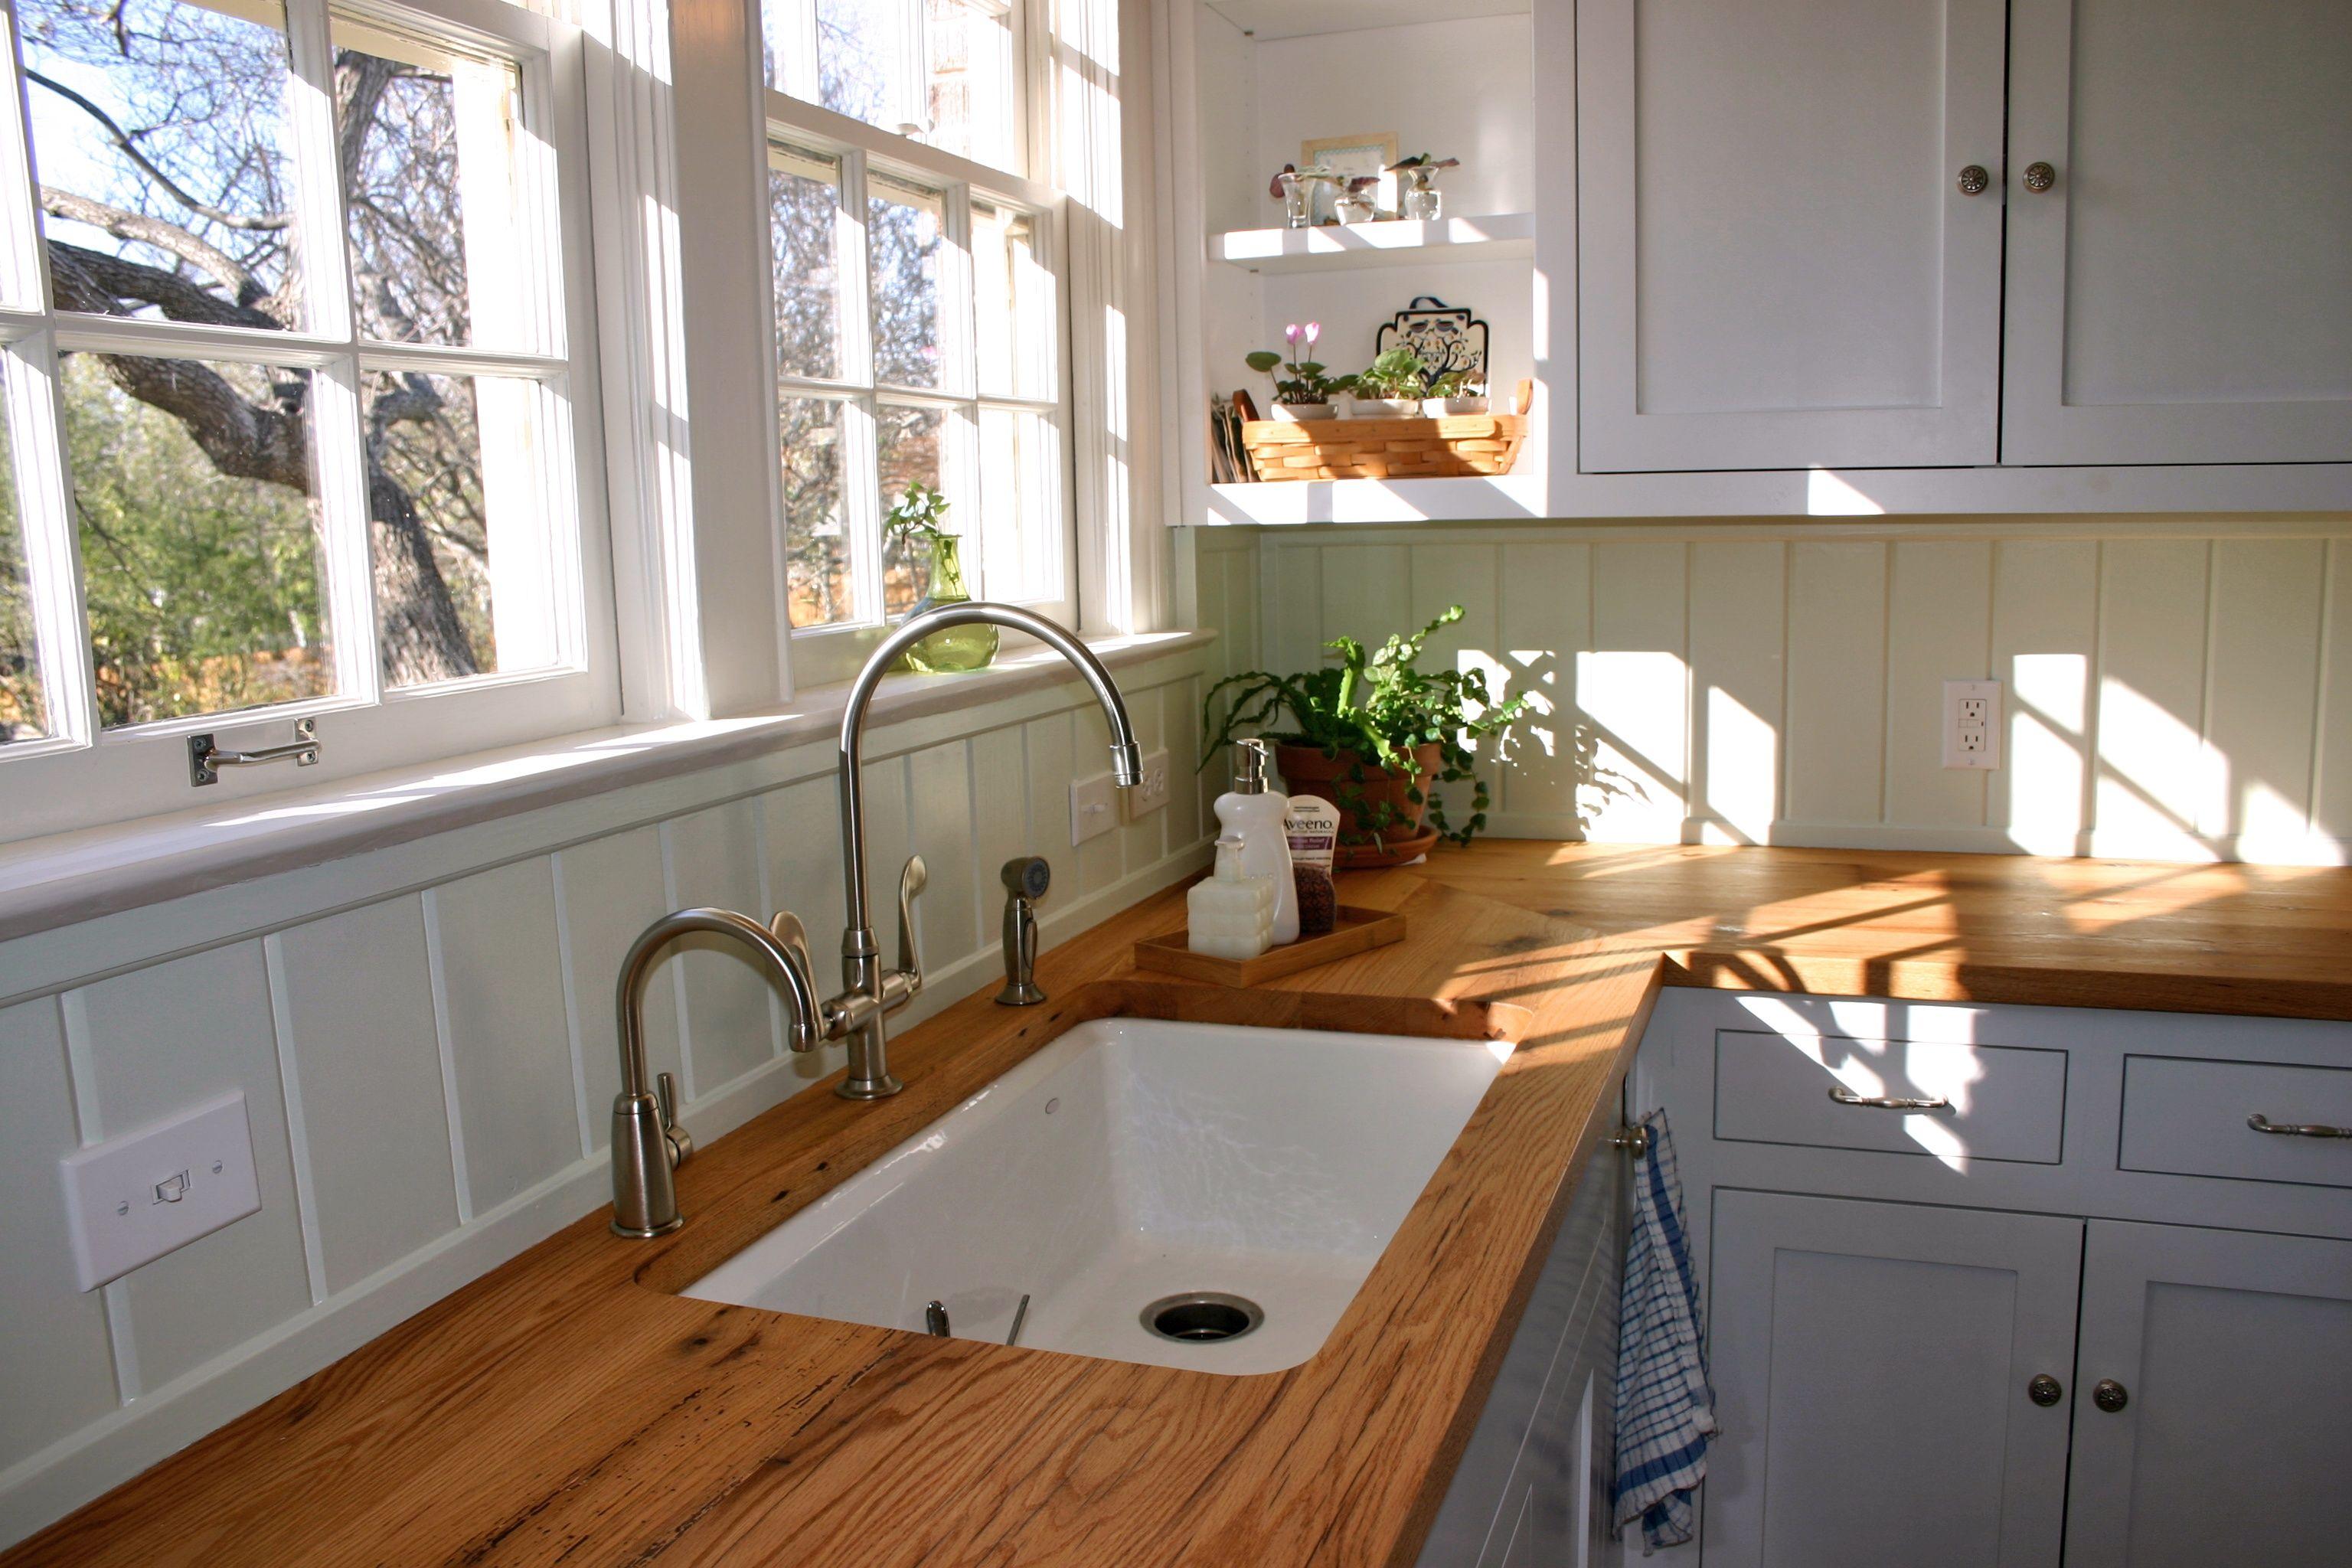 reclaimed white oak wood countertop photos wood countertops kitchen Reclaimed White Oak face grain custom wood countertop